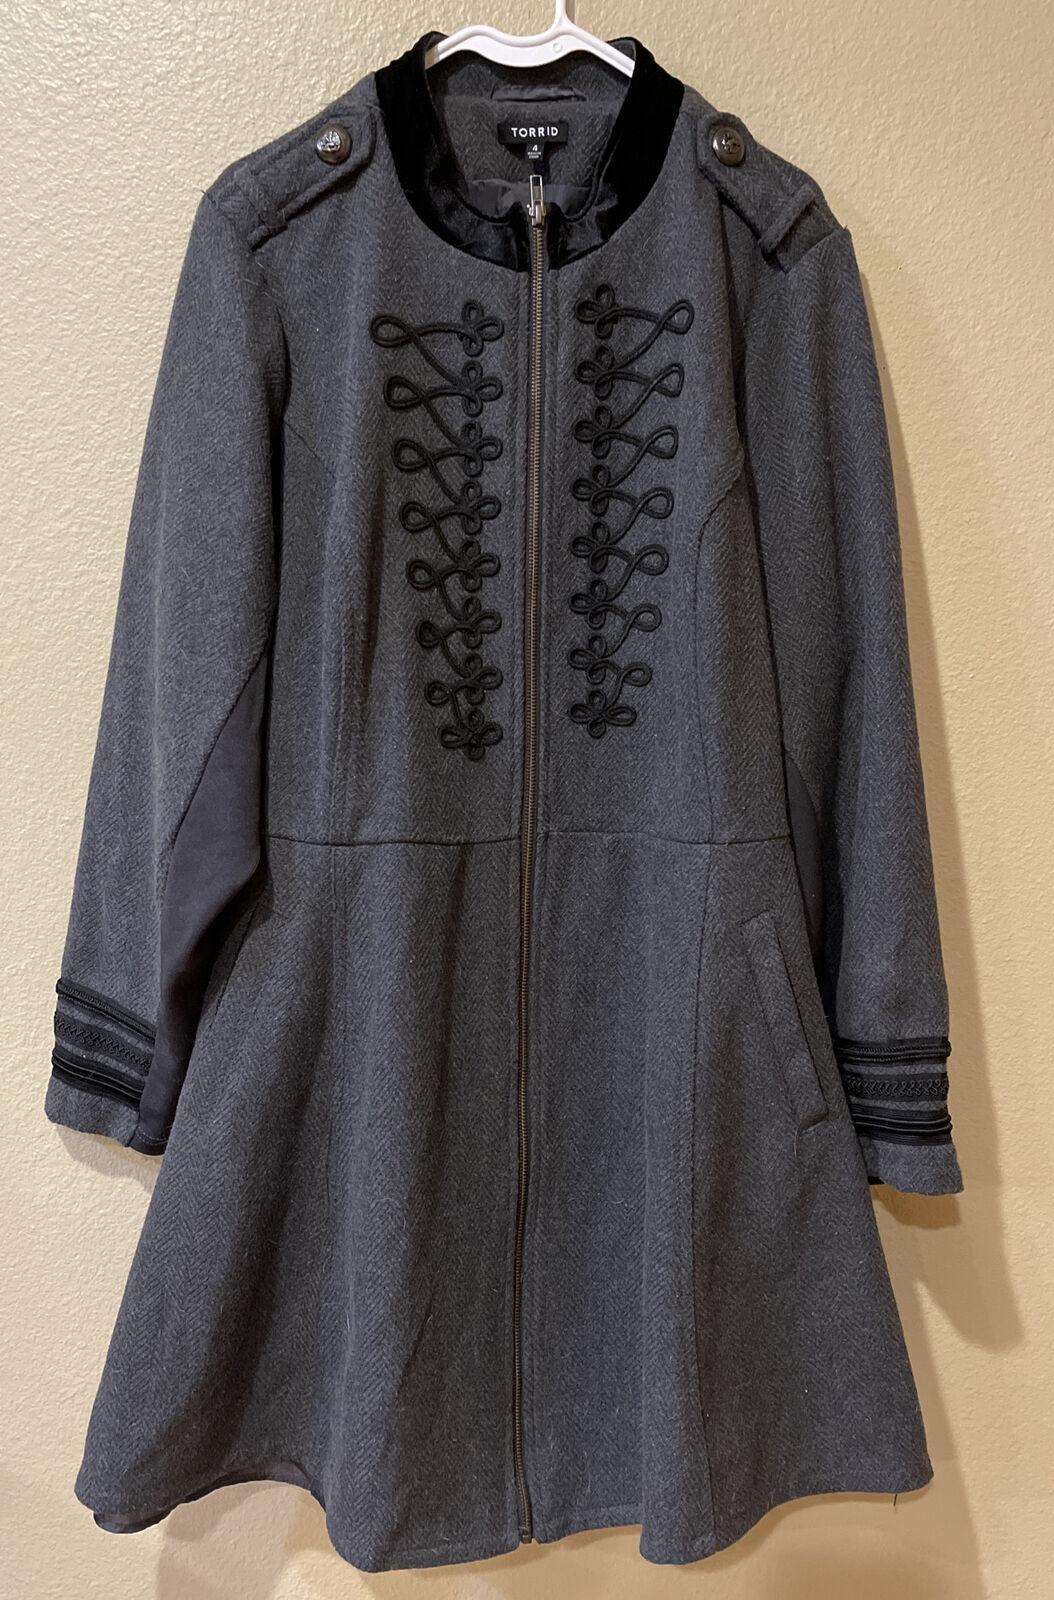 Torrid Size 4 Gray Women's Long Line Military Peplum Jacket Coat Victorian